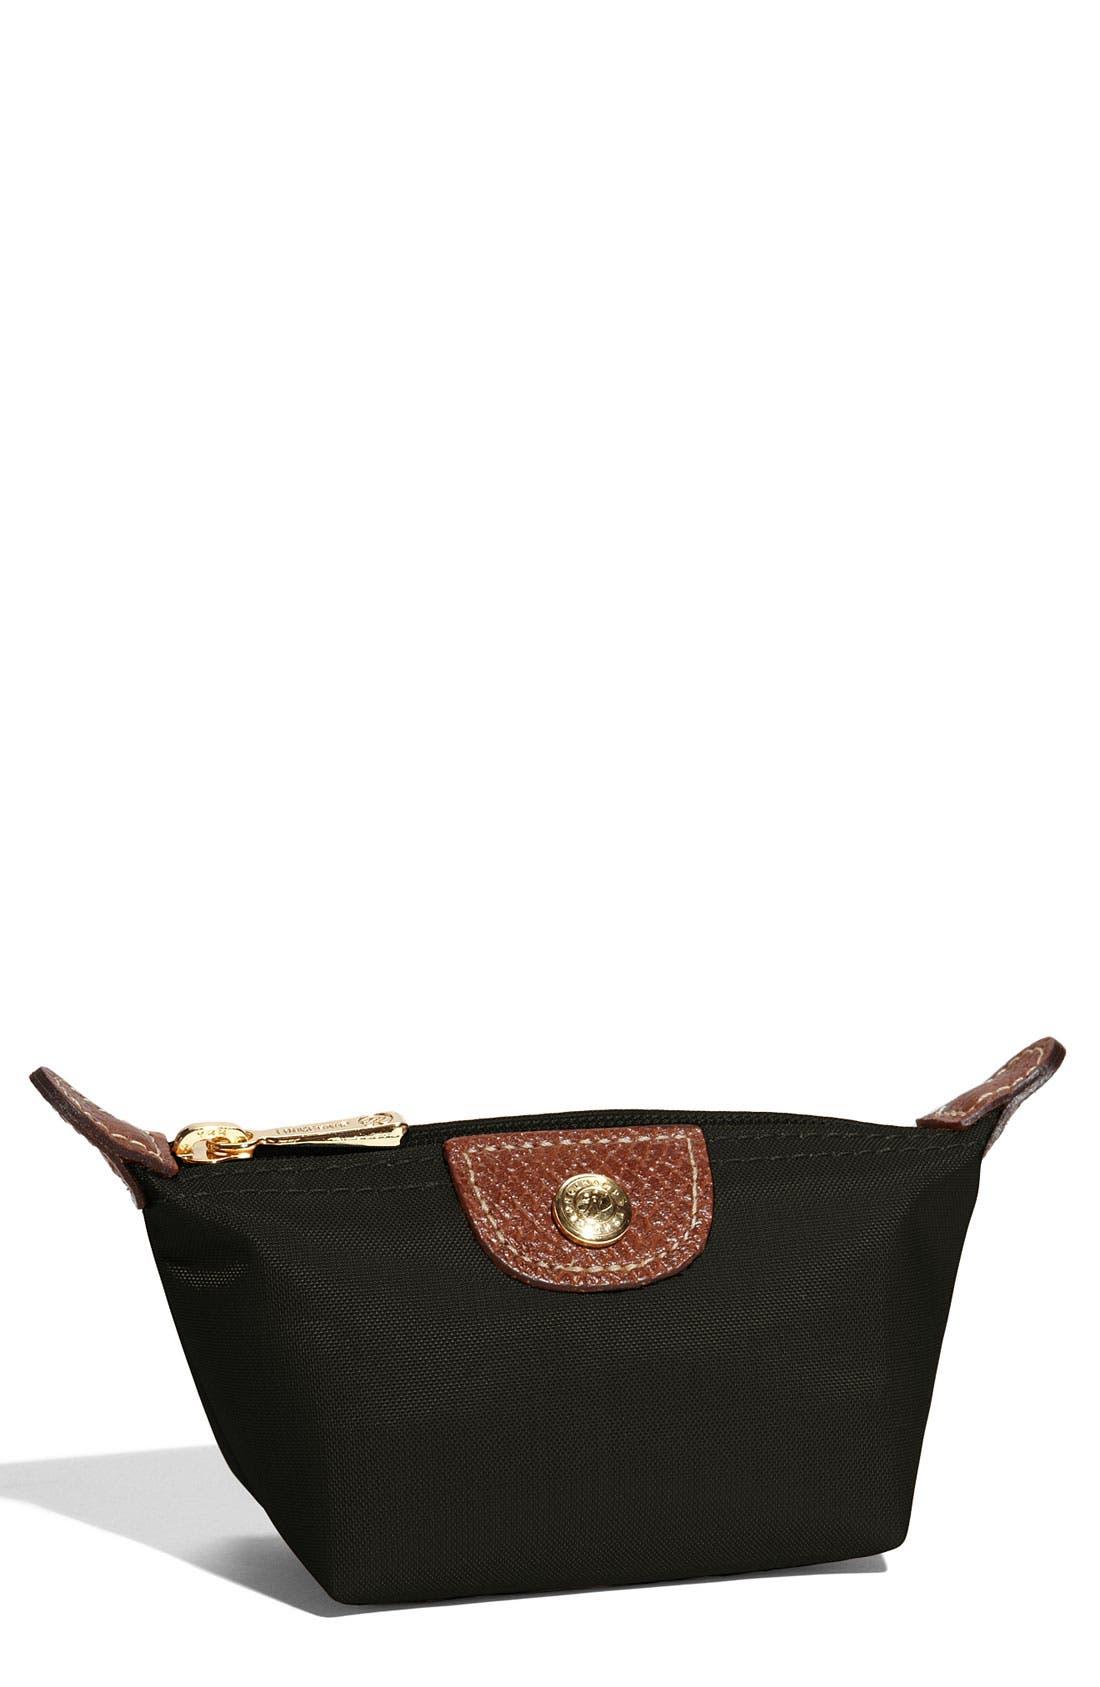 Main Image - Longchamp 'Le Pliage' Coin Purse